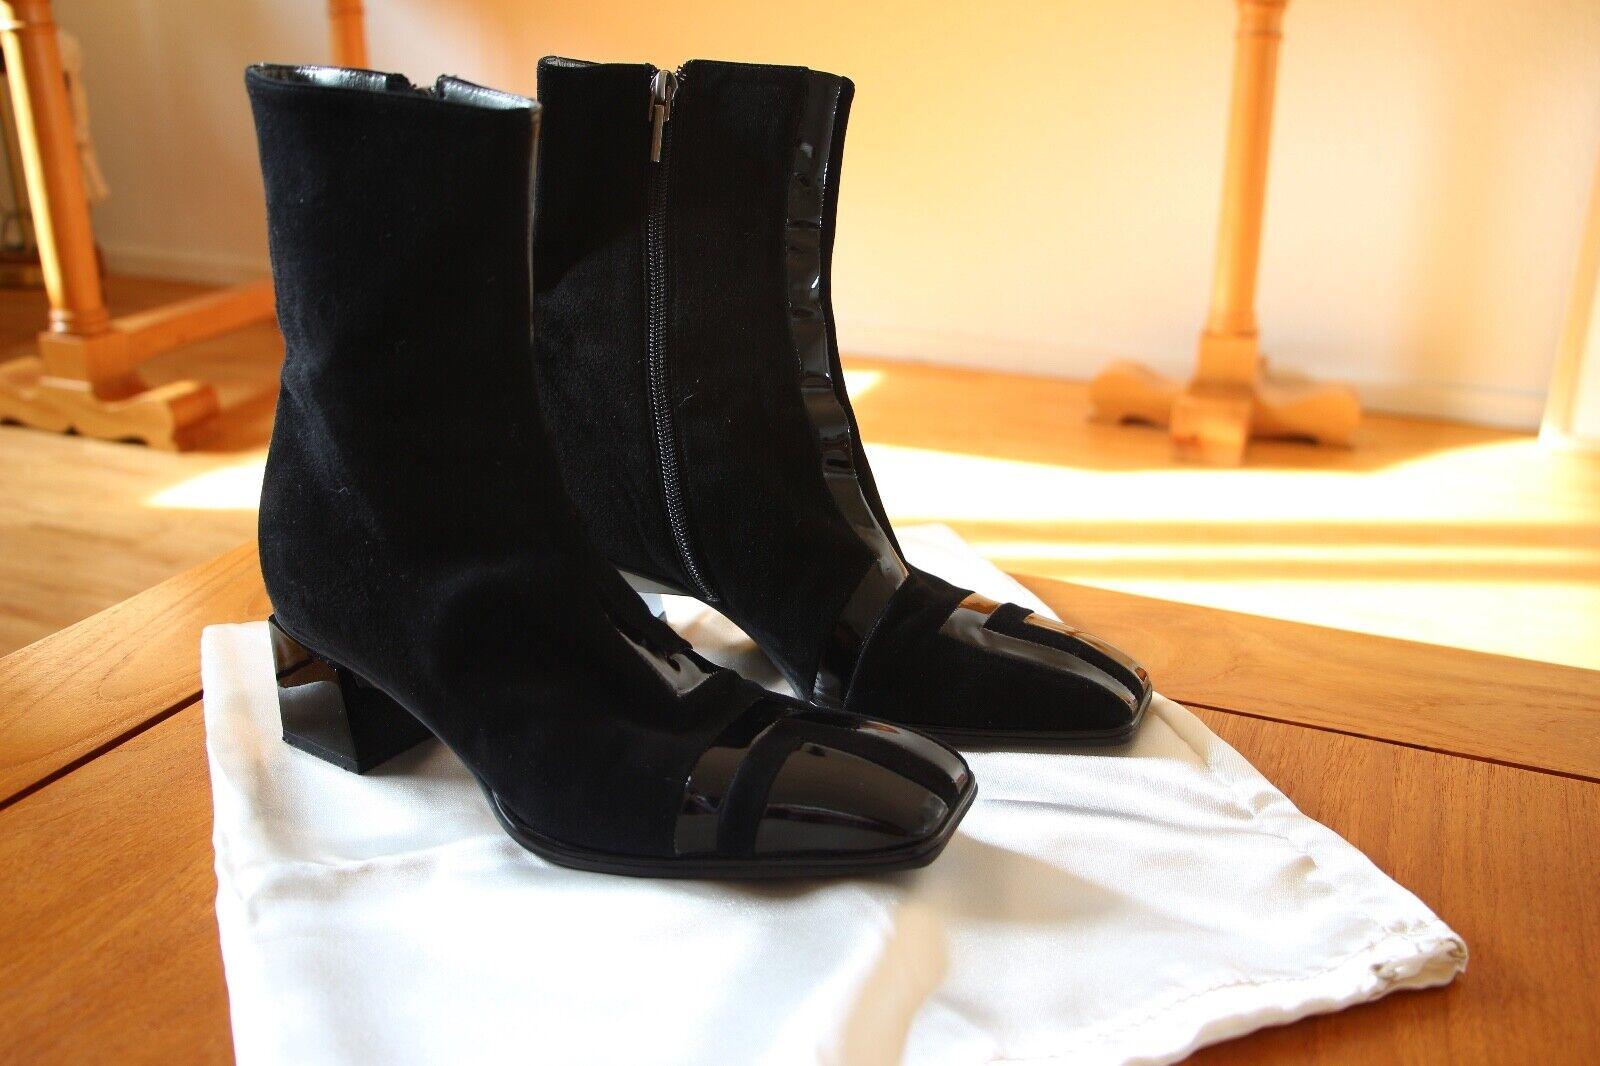 Sandro Vicari Venezia Stiefelette Leder Lack schwarz Größe 37 NEU&OVP